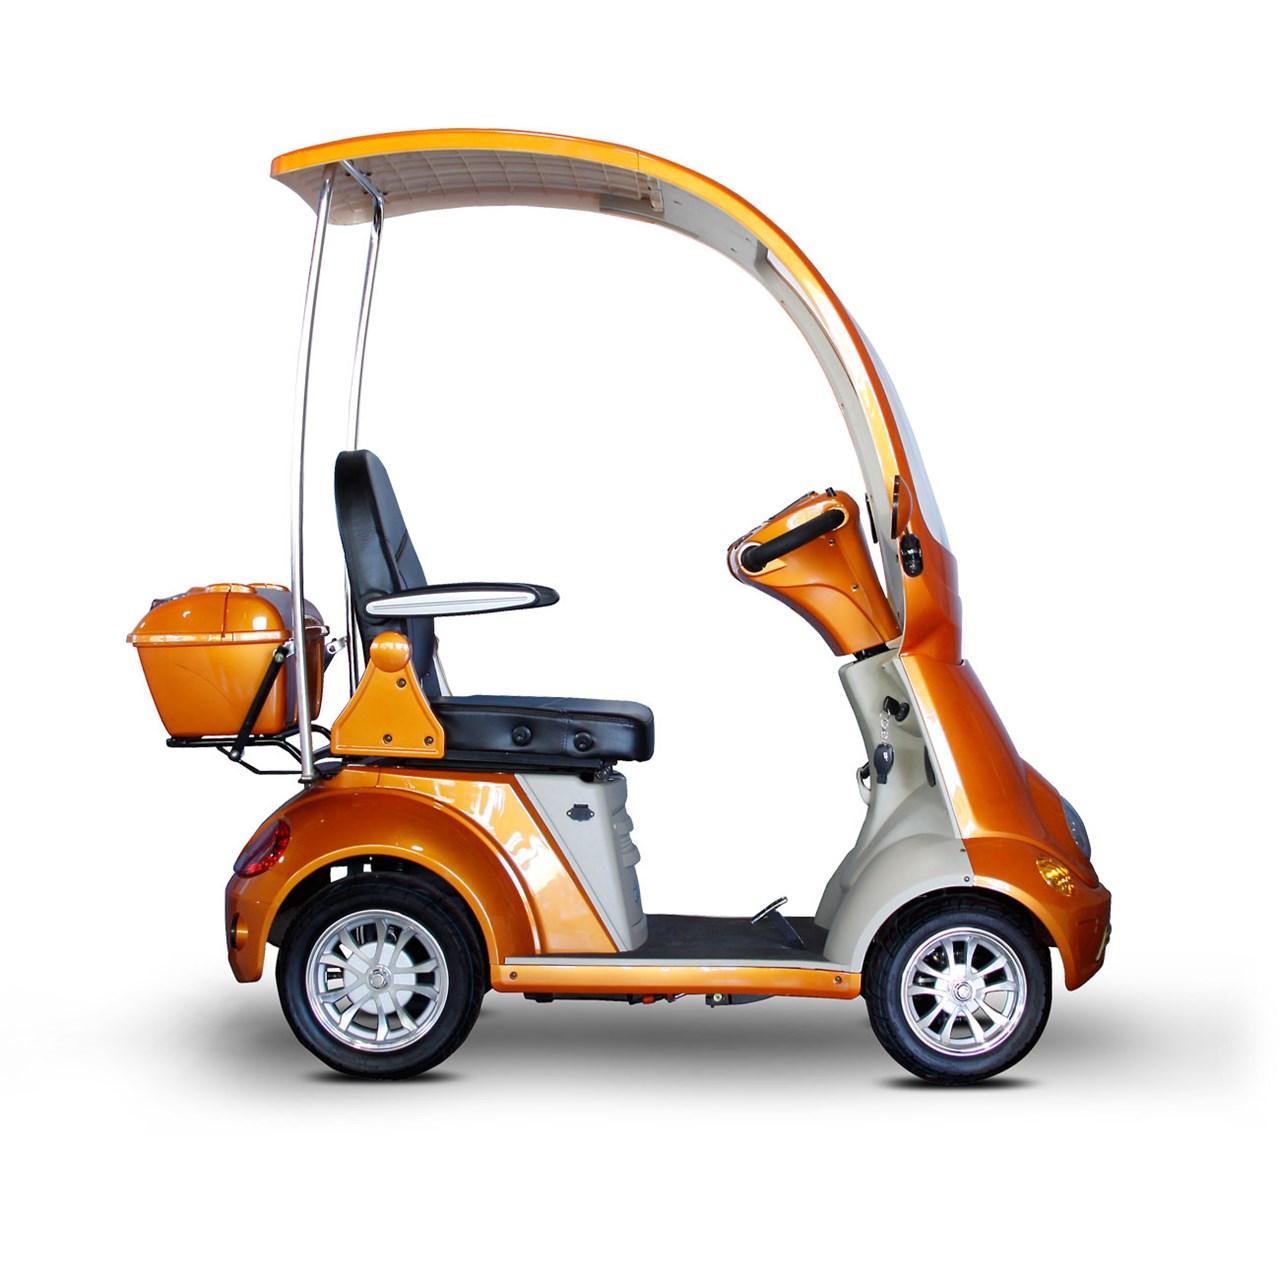 Maxiaids E Wheels Ew 54 4 Wheel Buggie Electric Mobility